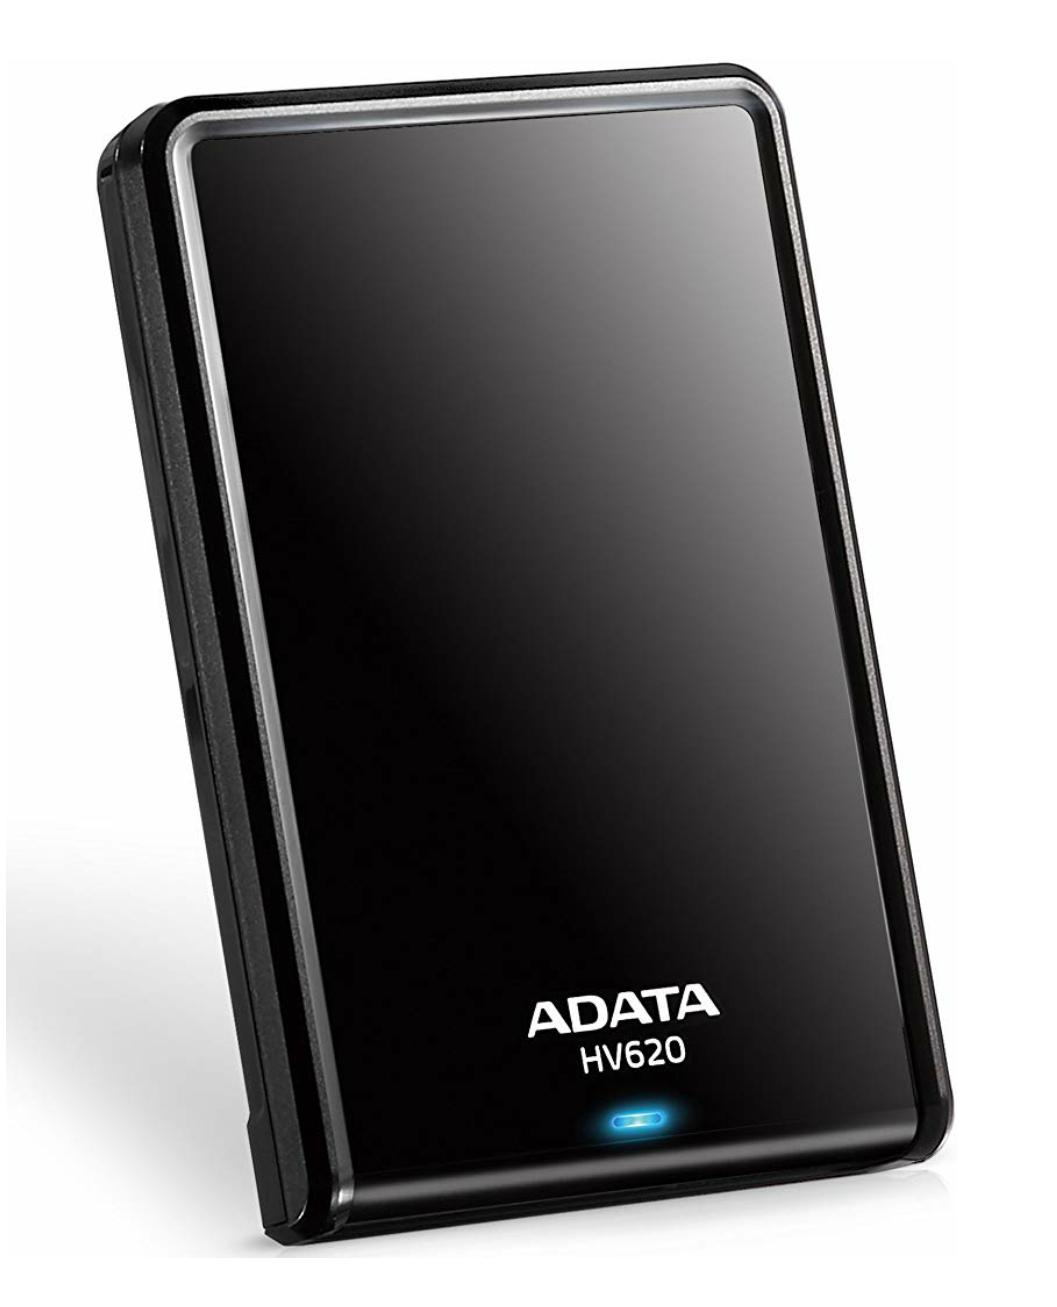 ADATA HV620 2TB USB 3.0 Externe Festplatte, schwarz